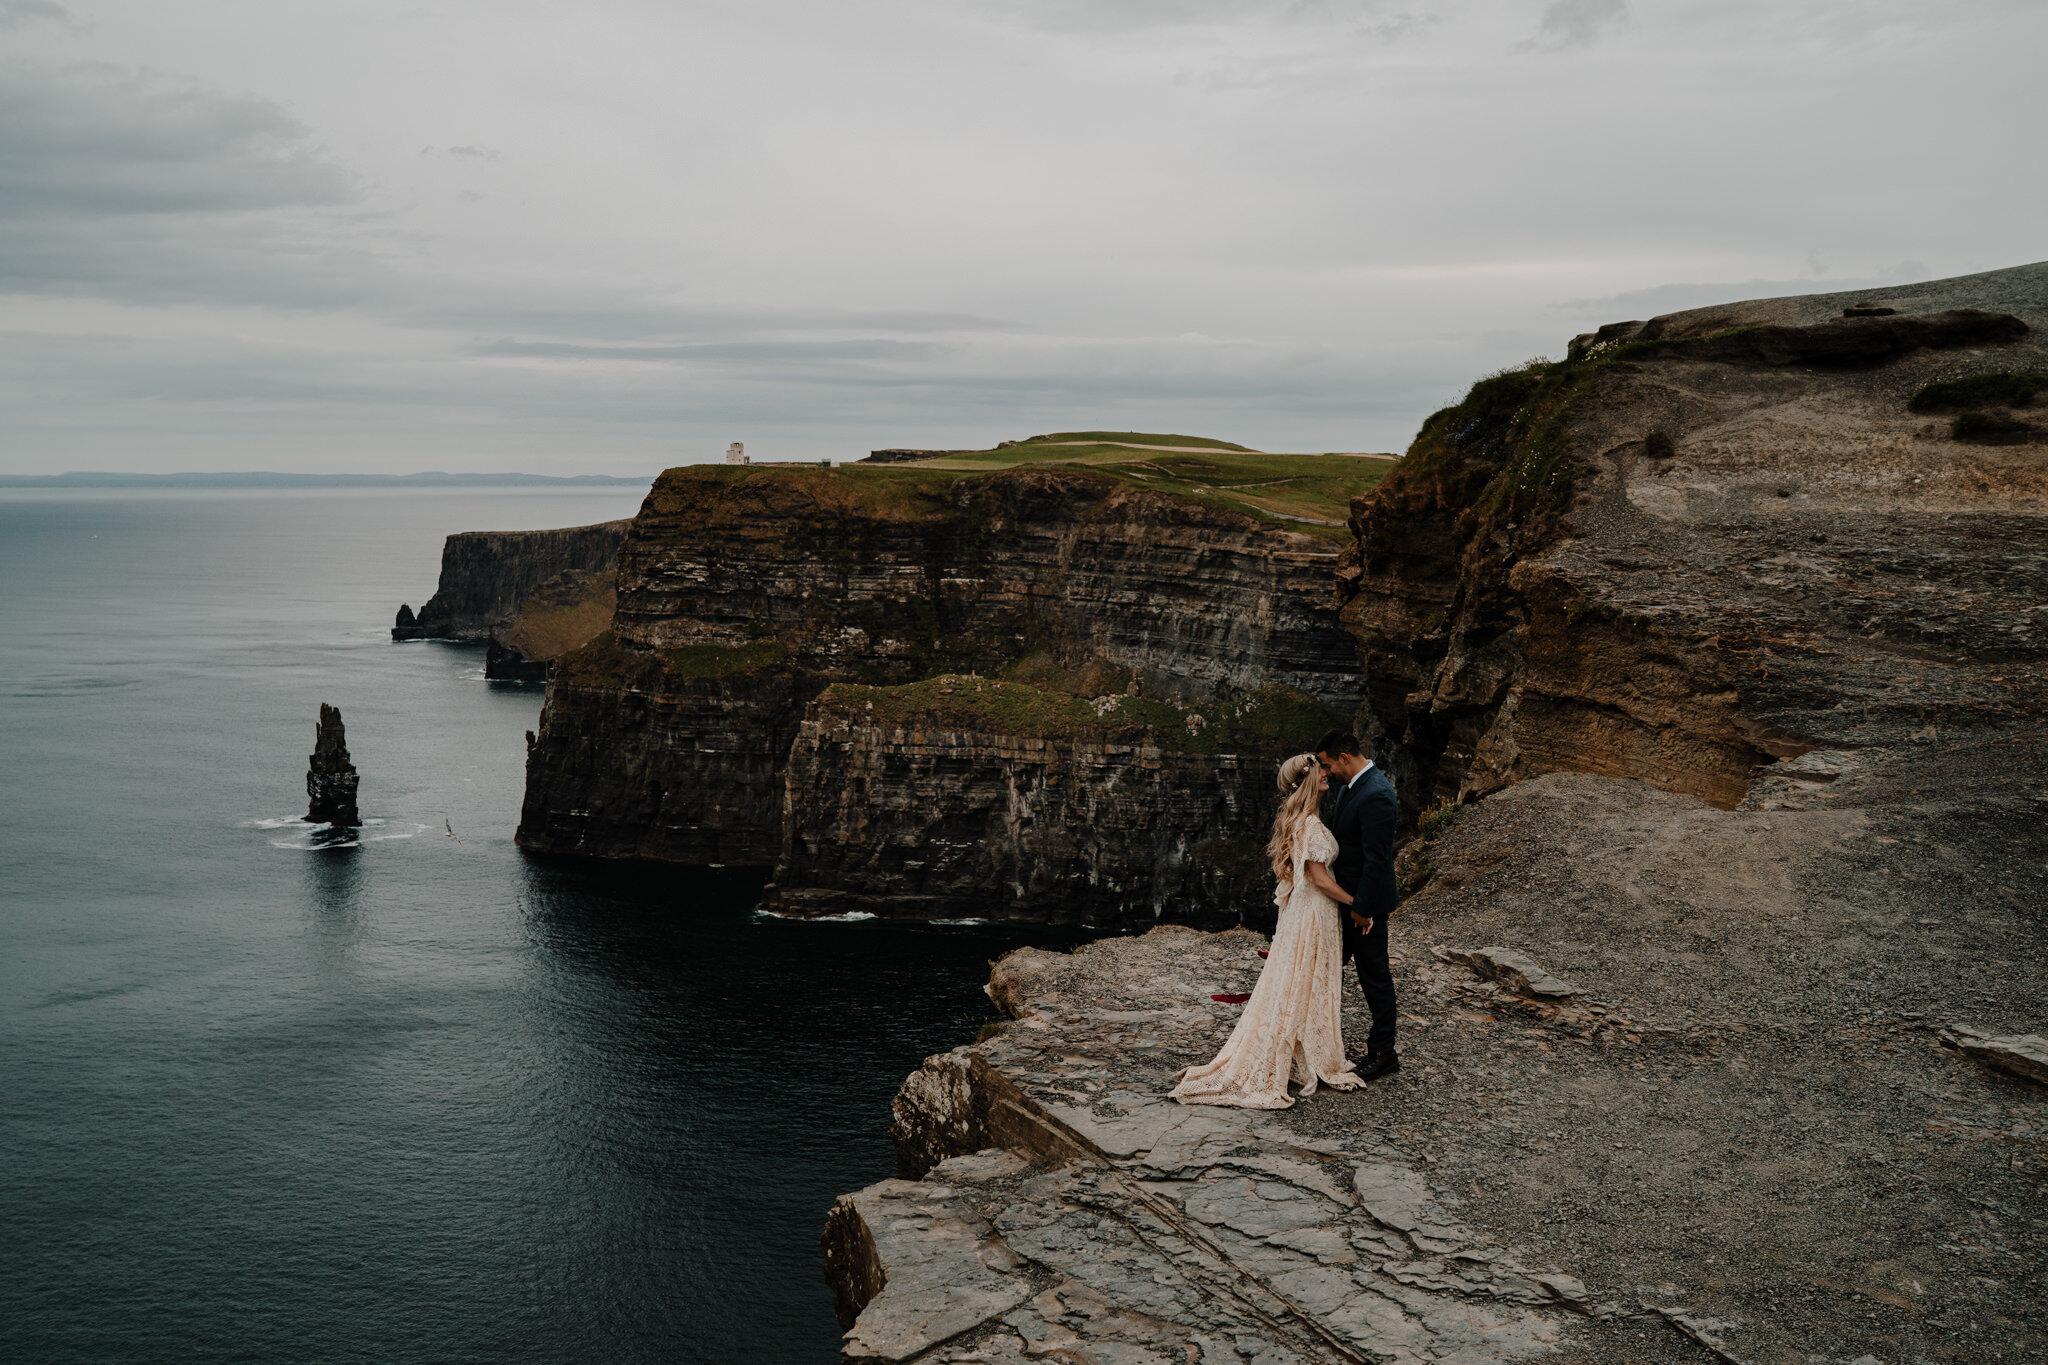 ballycastle beach couples adventure elopement wedding photographer northern ireland